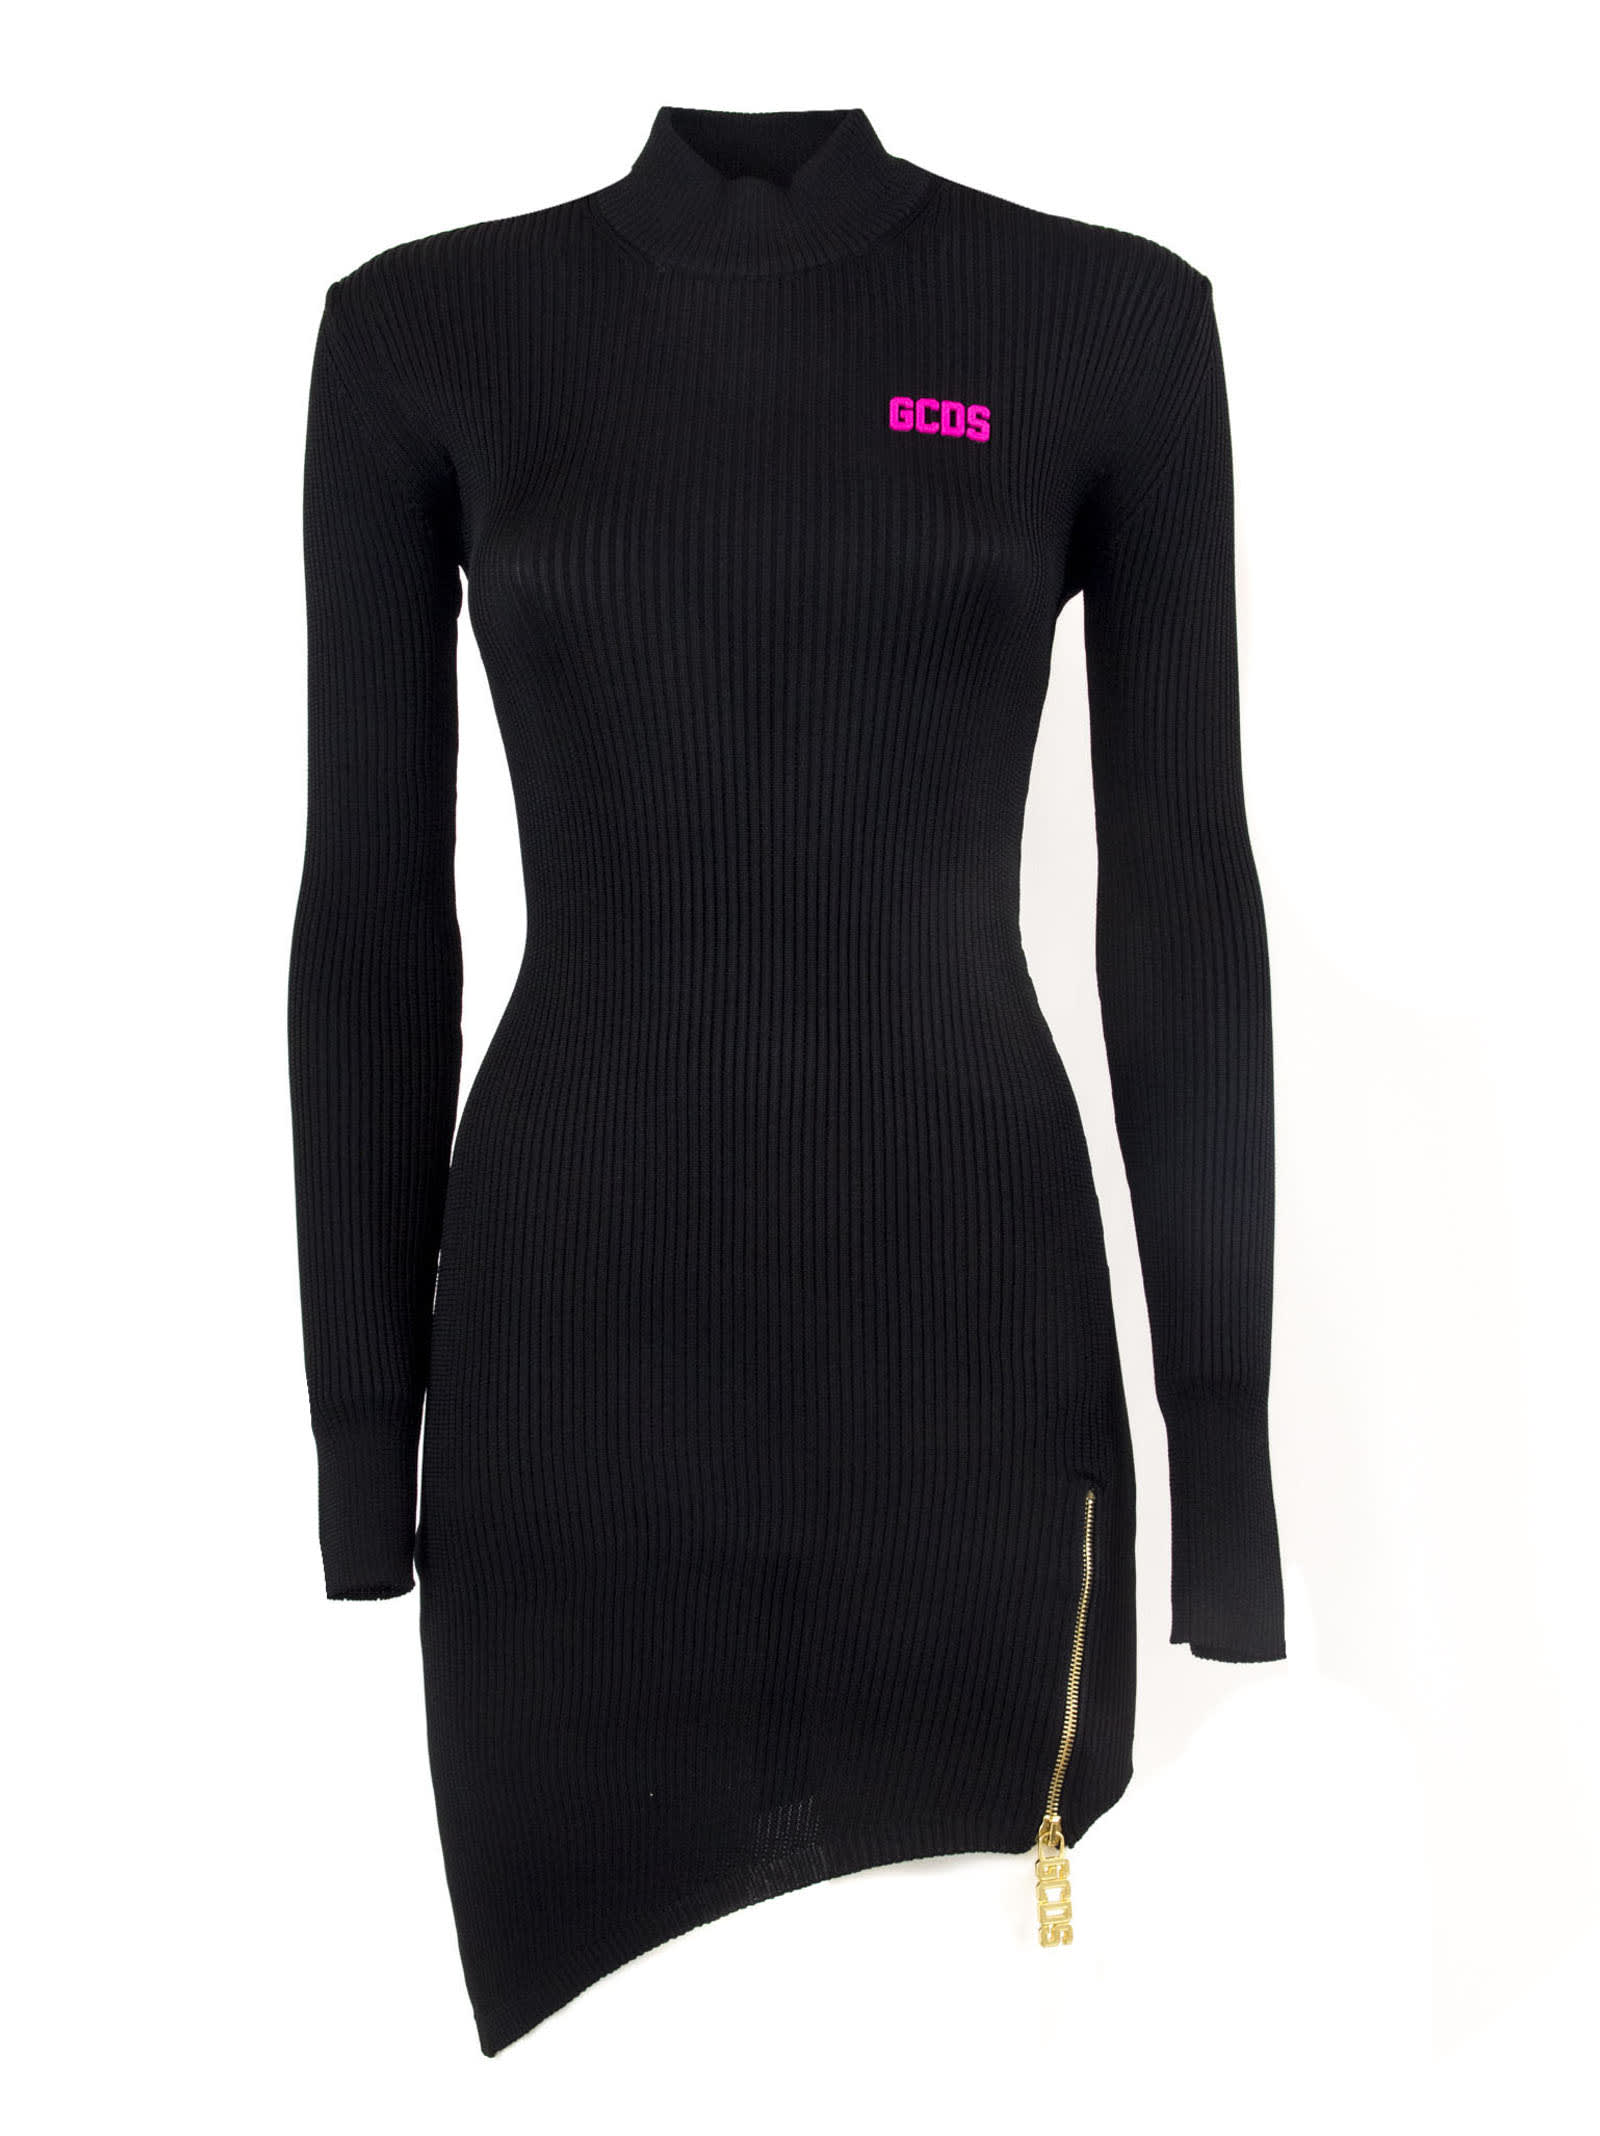 GCDS Black Ribbed Sweater Dress